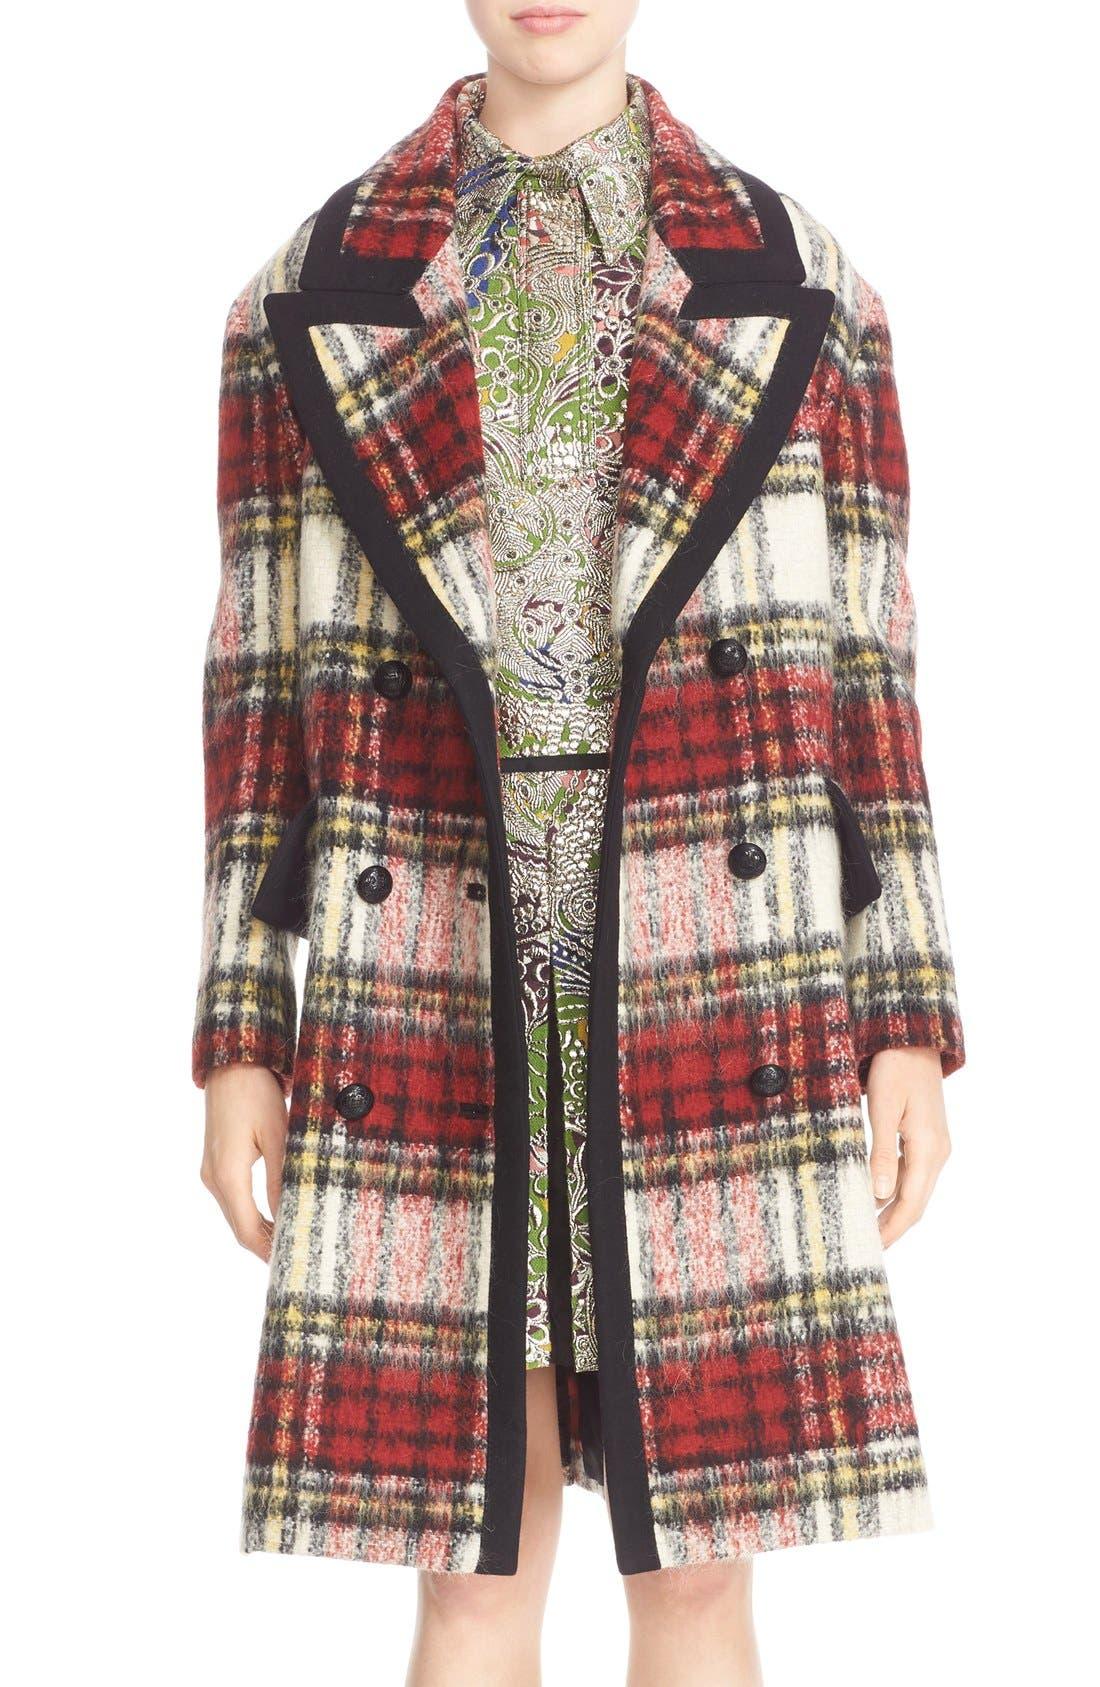 BURBERRY PRORSUM,                             Tartan Plaid Wool Blend Coat,                             Main thumbnail 1, color,                             930